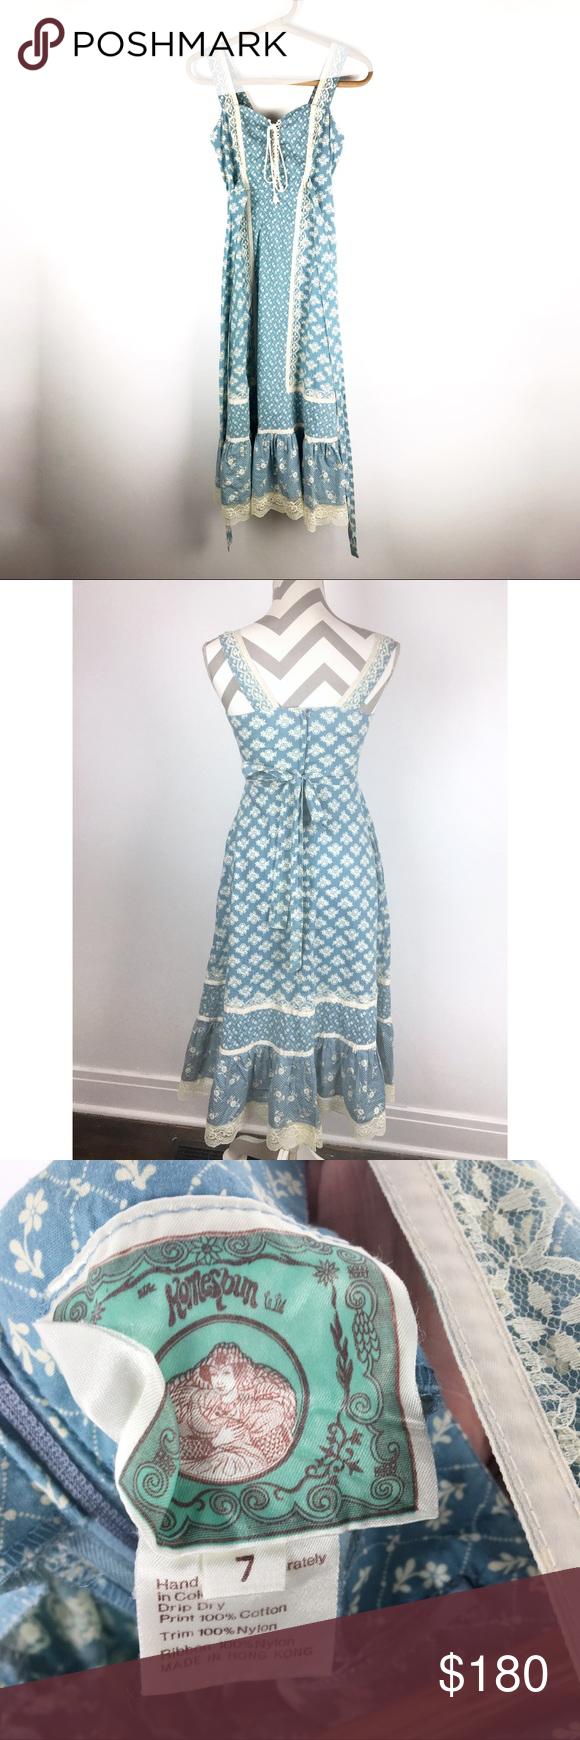 Vintage 70 S Homespun Calico Prairie Dress Xs Prairie Dress Homespun Dresses Xs [ 1740 x 580 Pixel ]